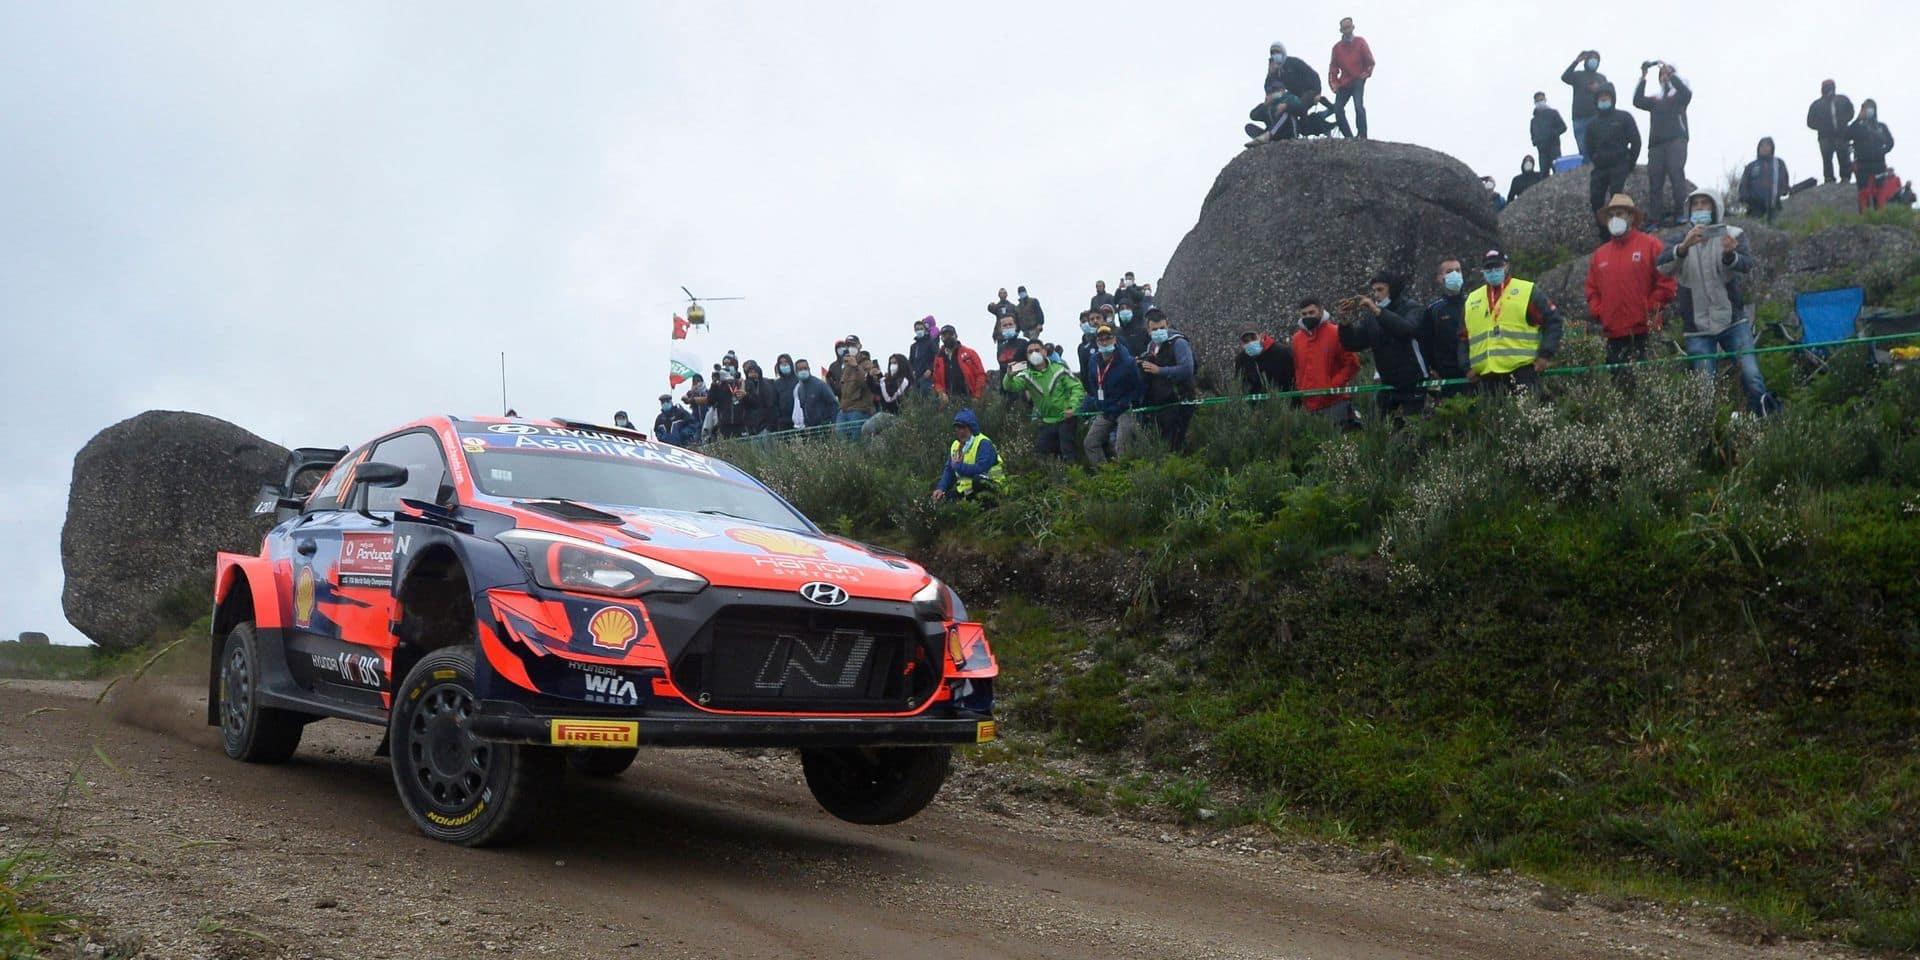 Rallye du Portugal: Hyundai retire Thierry Neuville de la course